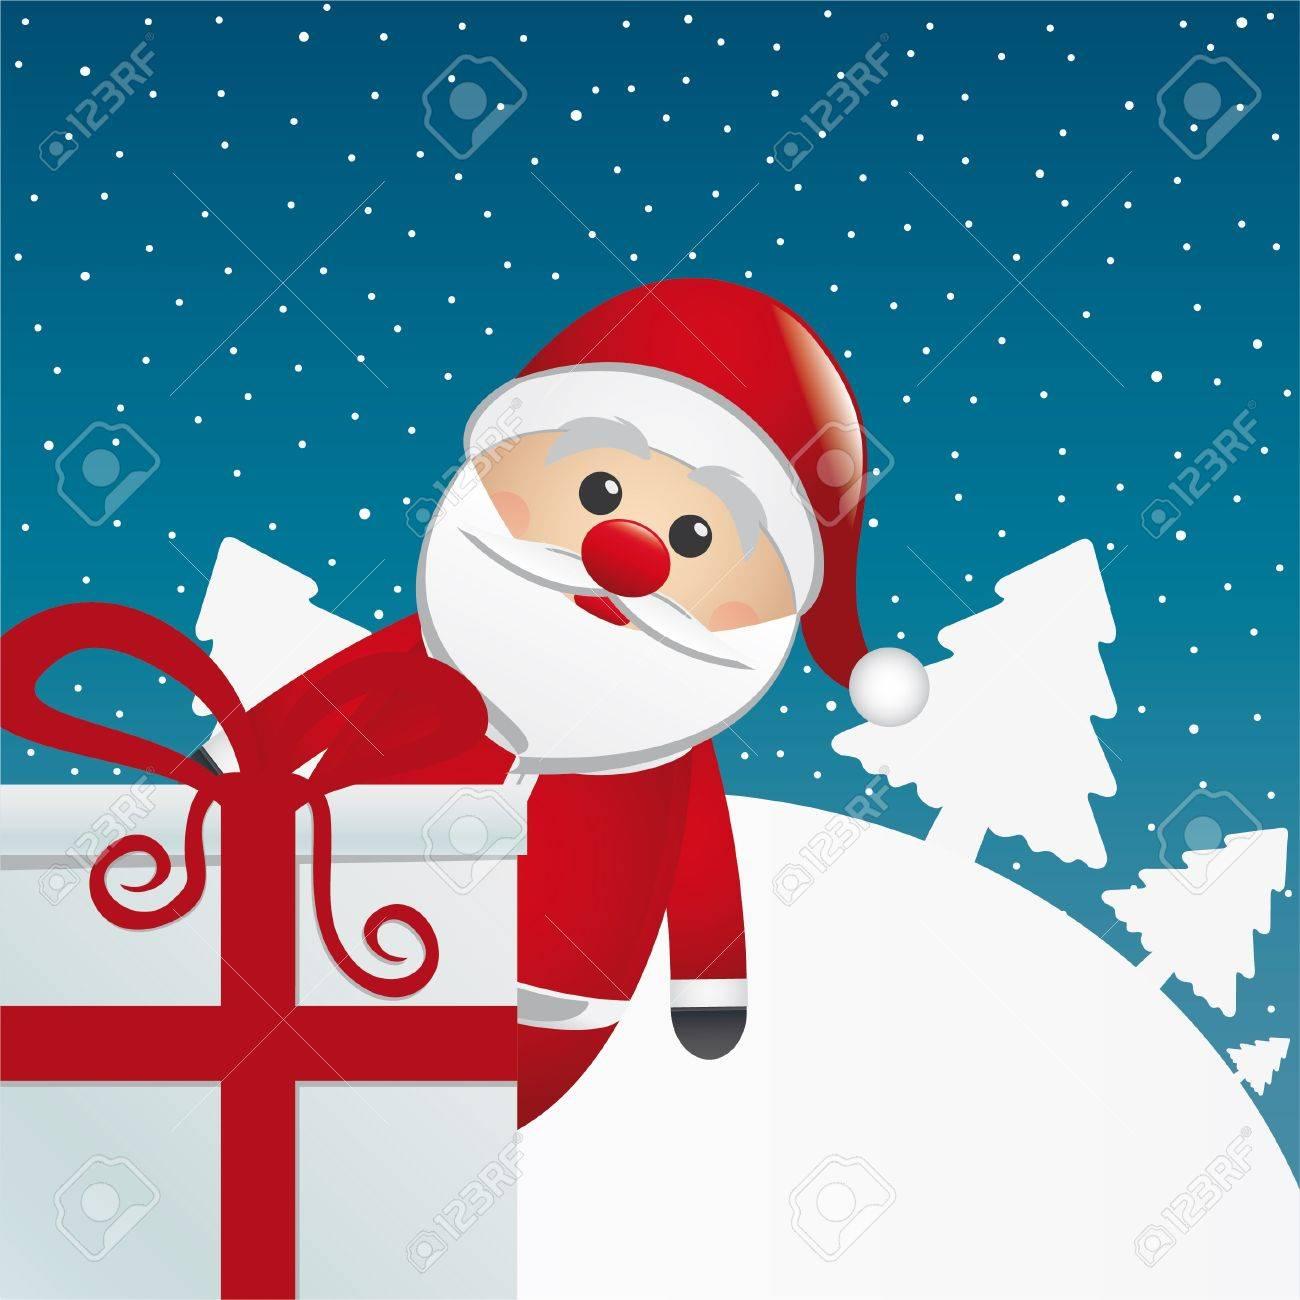 santa behind gift box white winter landscape - 16068346